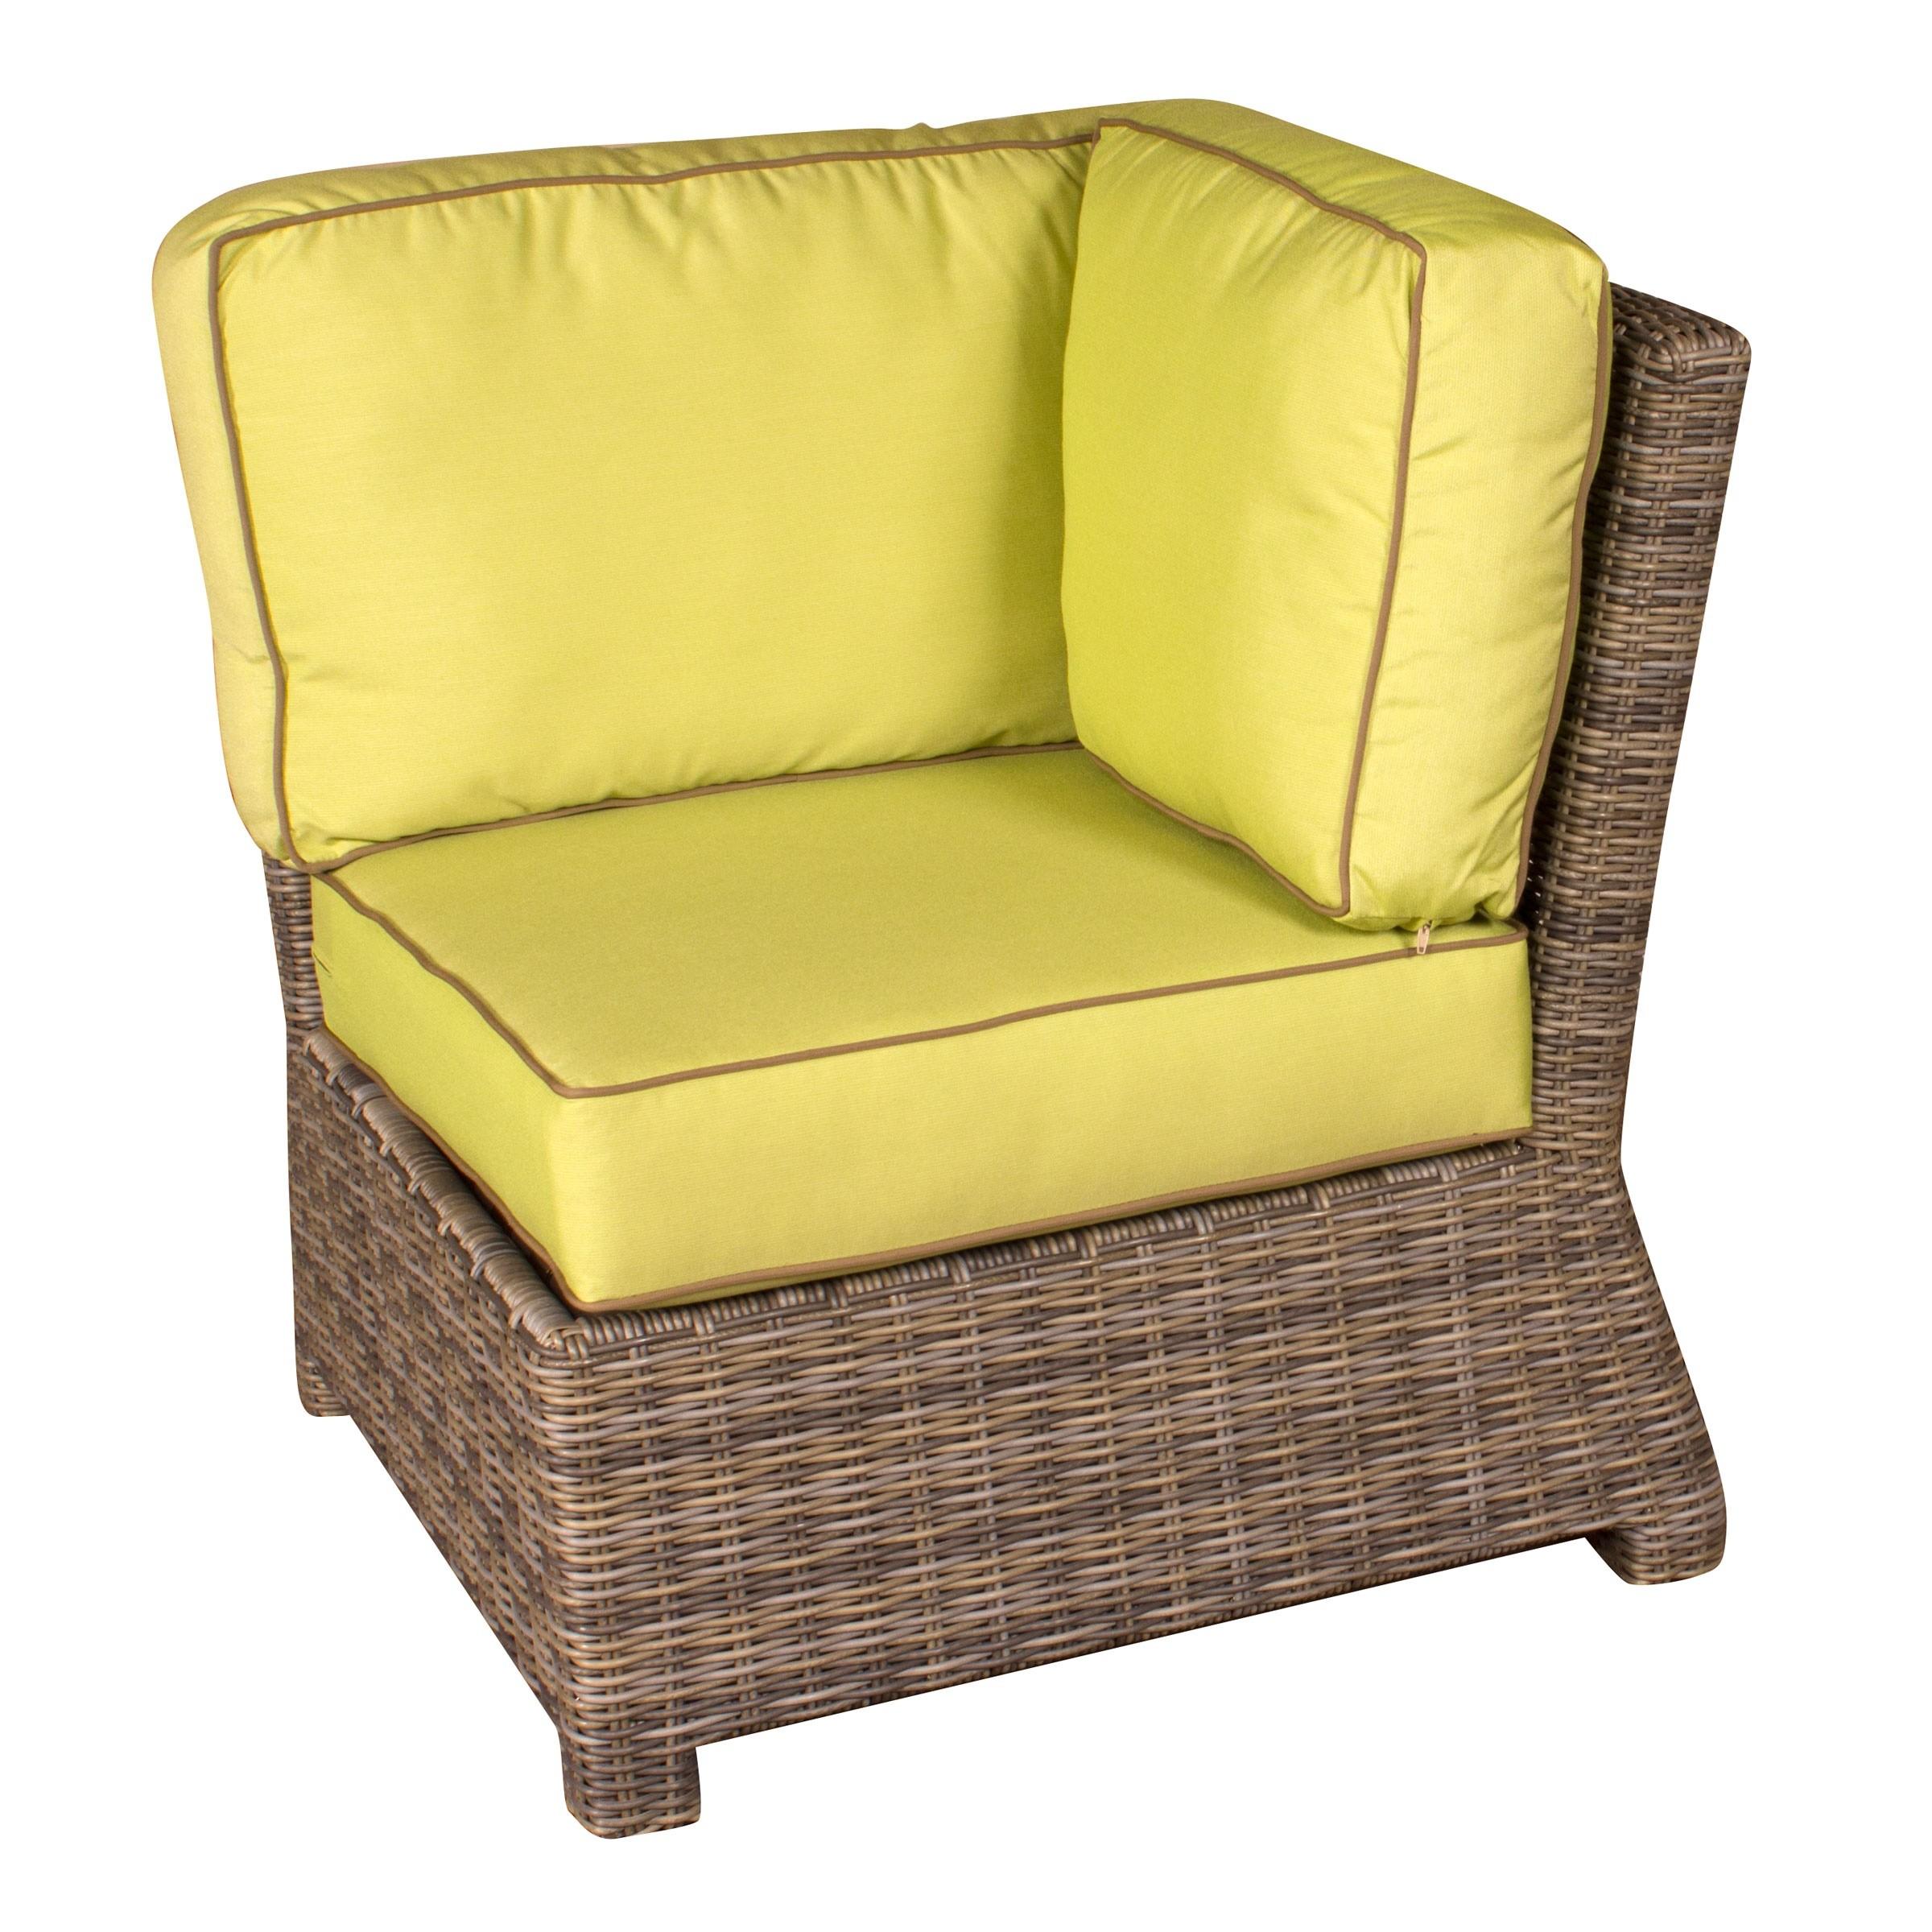 Northcape Bainbridge 90° Sectional Chair